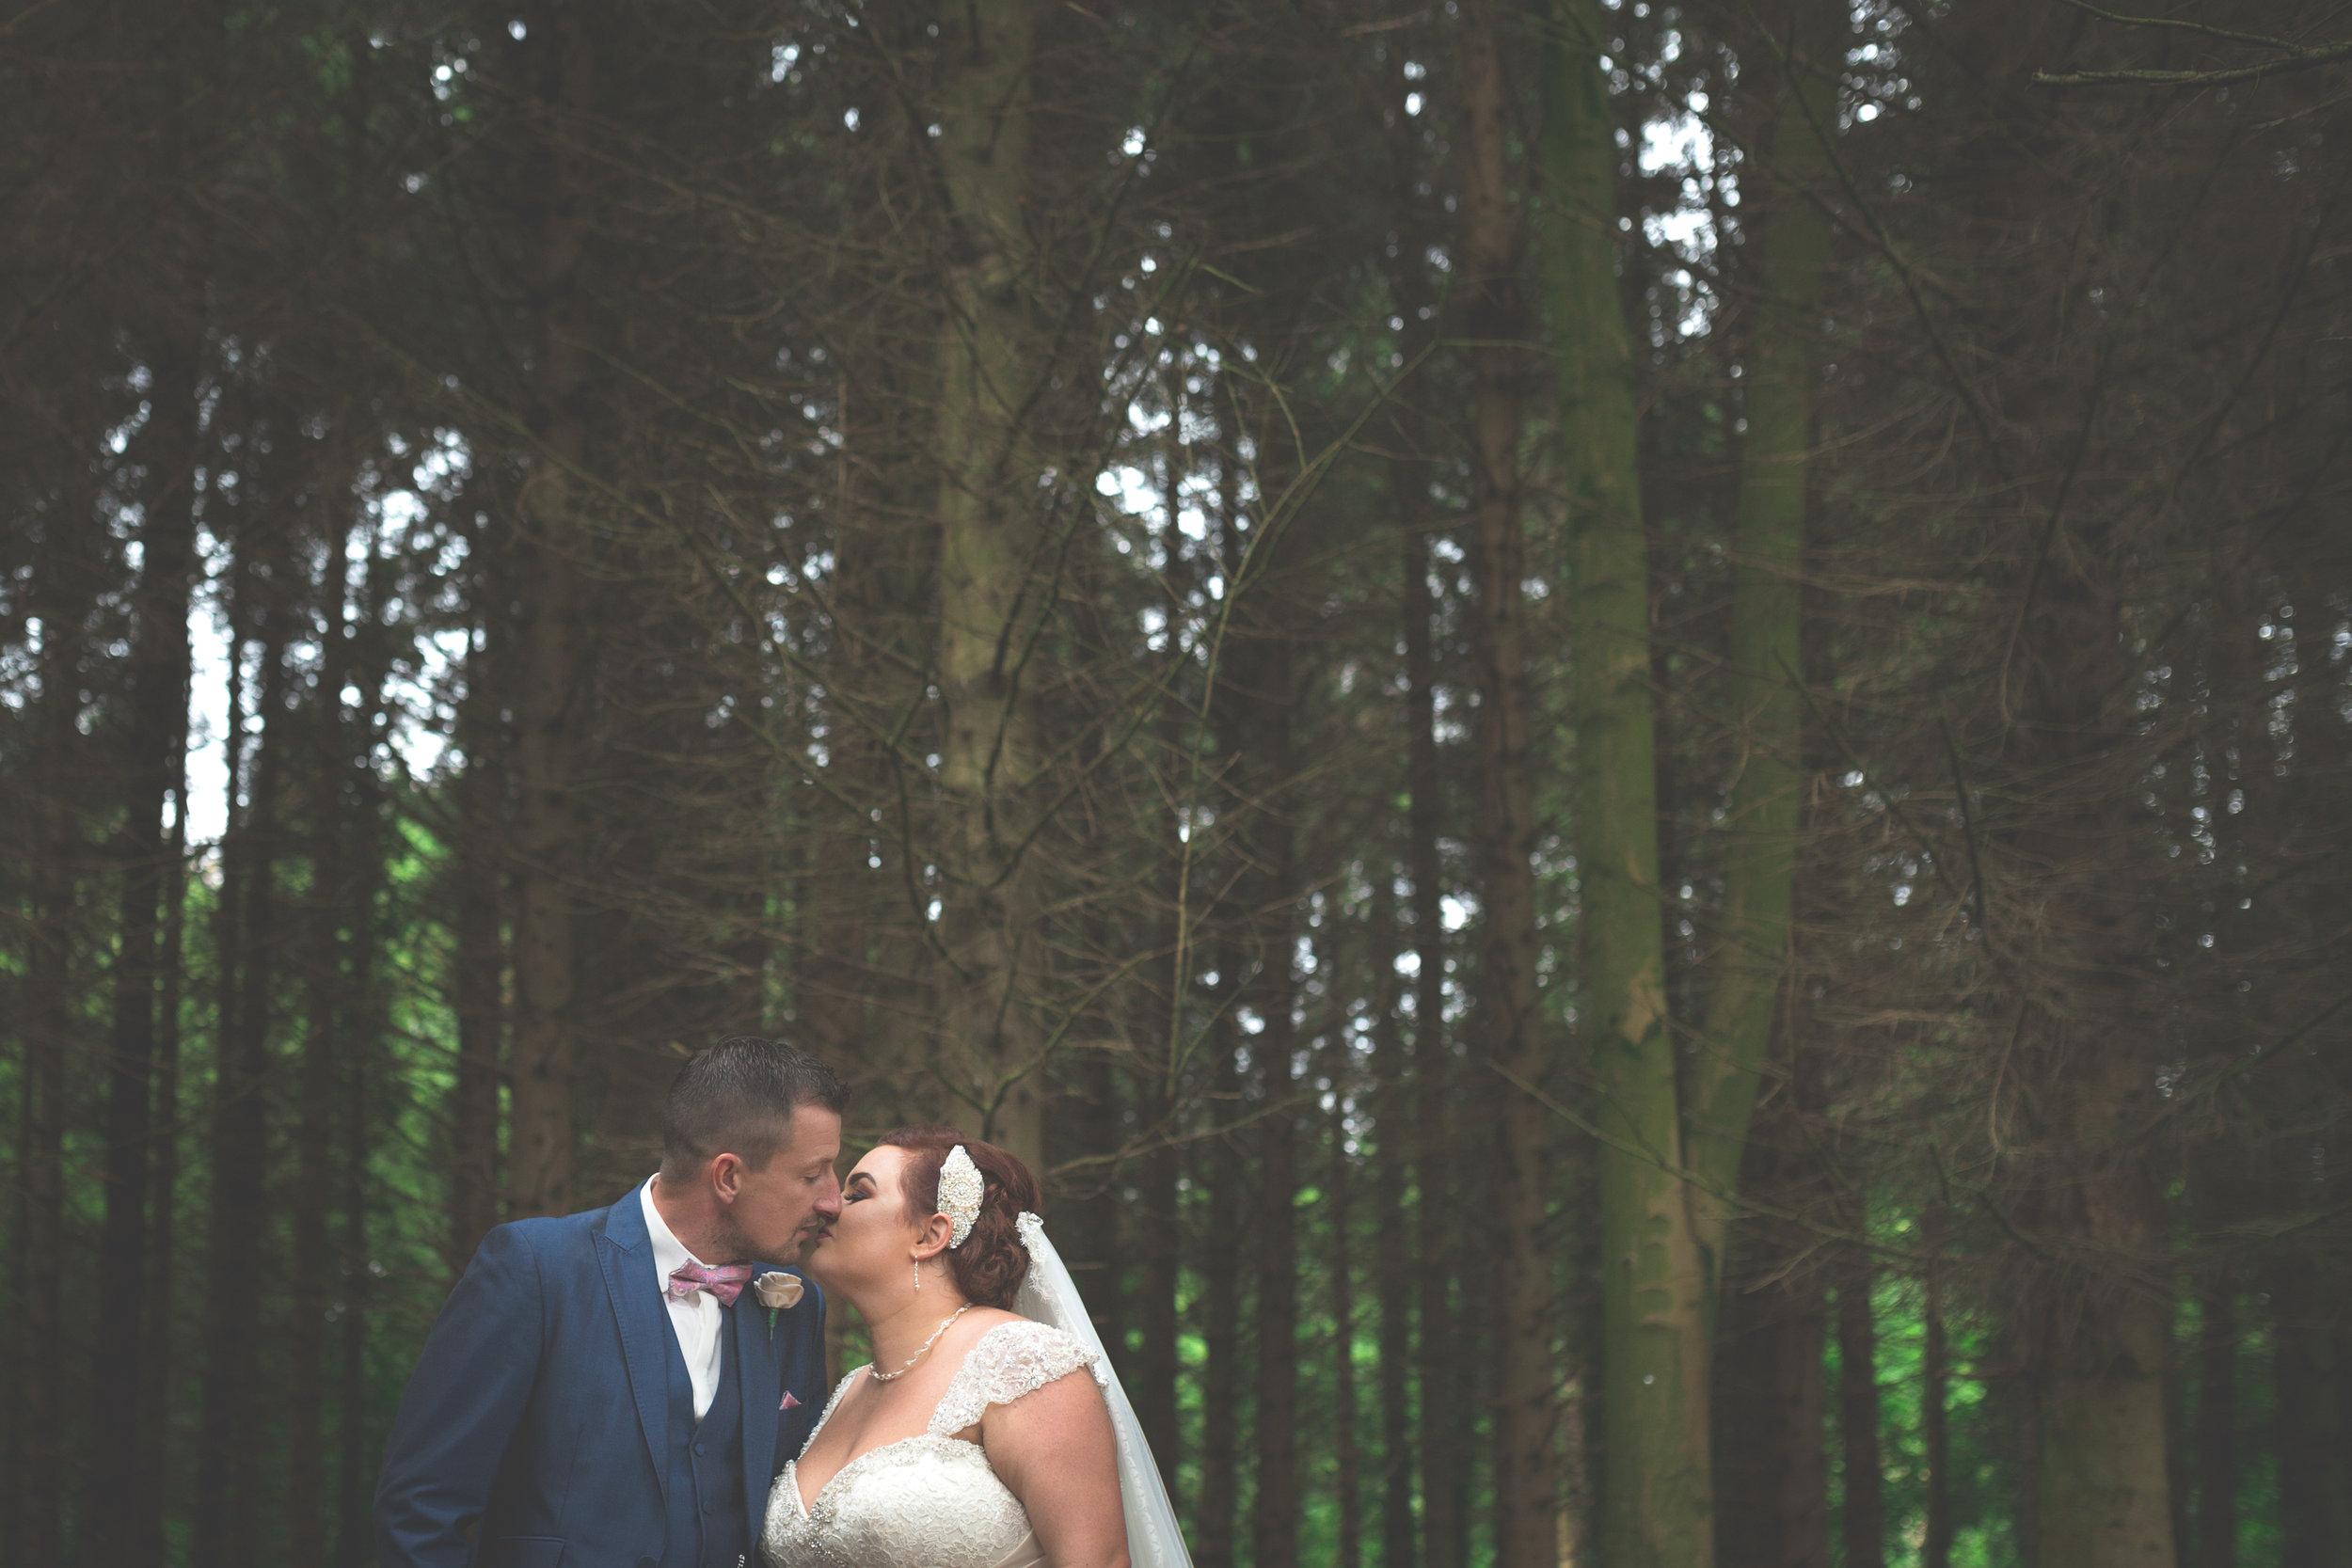 Antoinette & Stephen - Portraits | Brian McEwan Photography | Wedding Photographer Northern Ireland 23.jpg